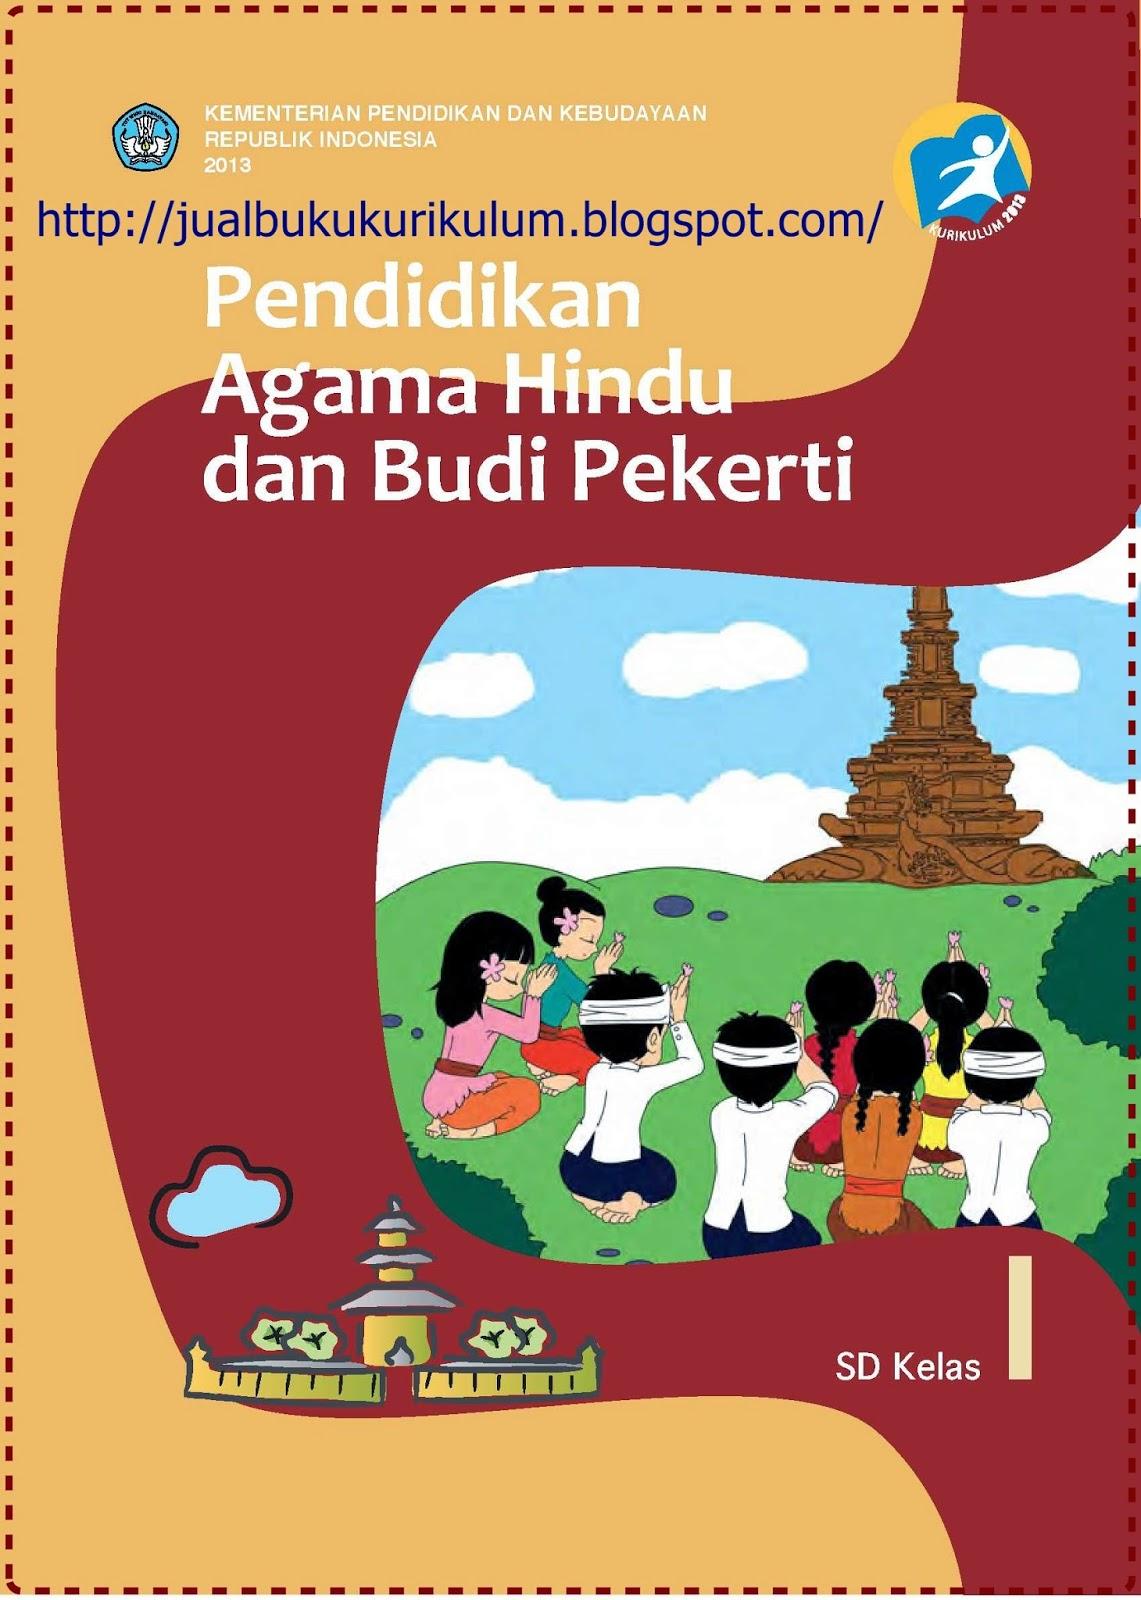 Buku Kurikulum 2013 Sd Kelas 1 Distributor Buku Kurikulum Distributor Buku Pramuka Buku